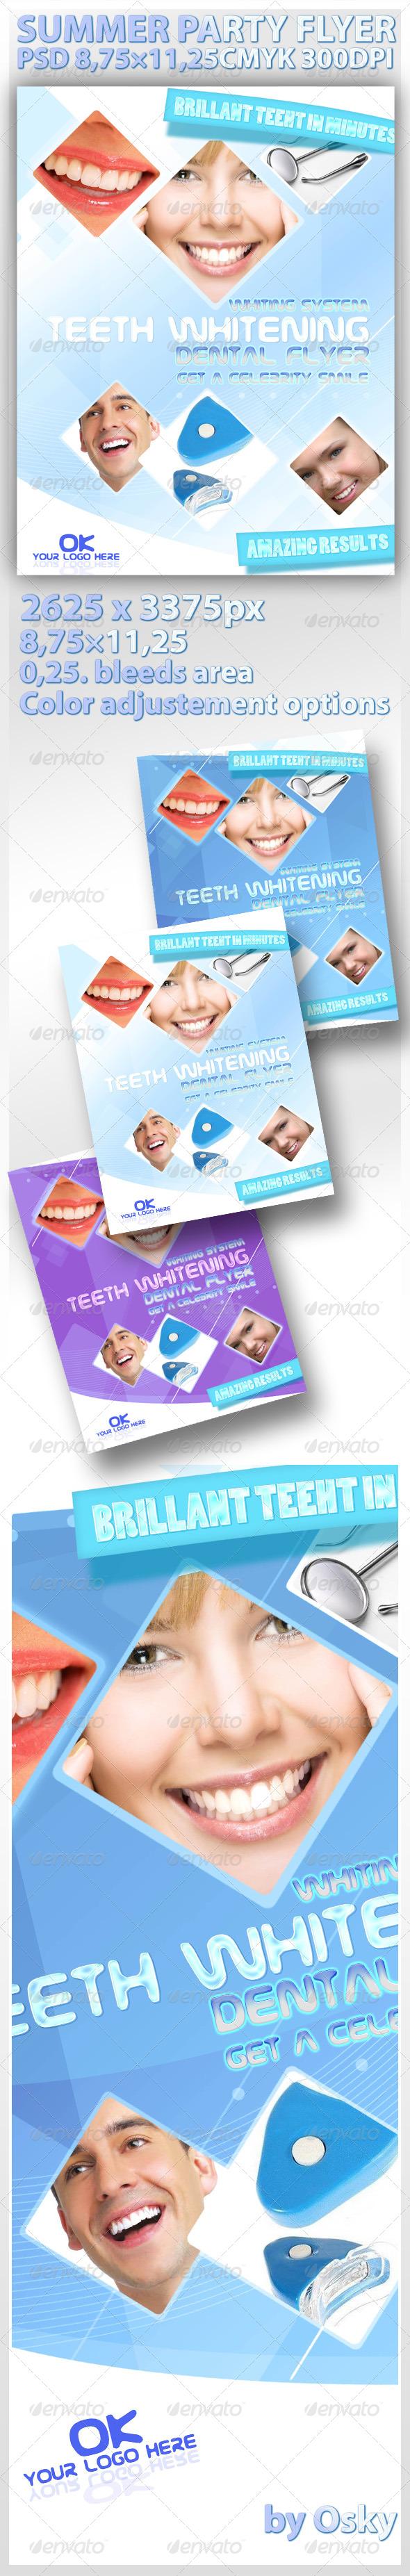 Professional Dental Flyer - Commerce Flyers